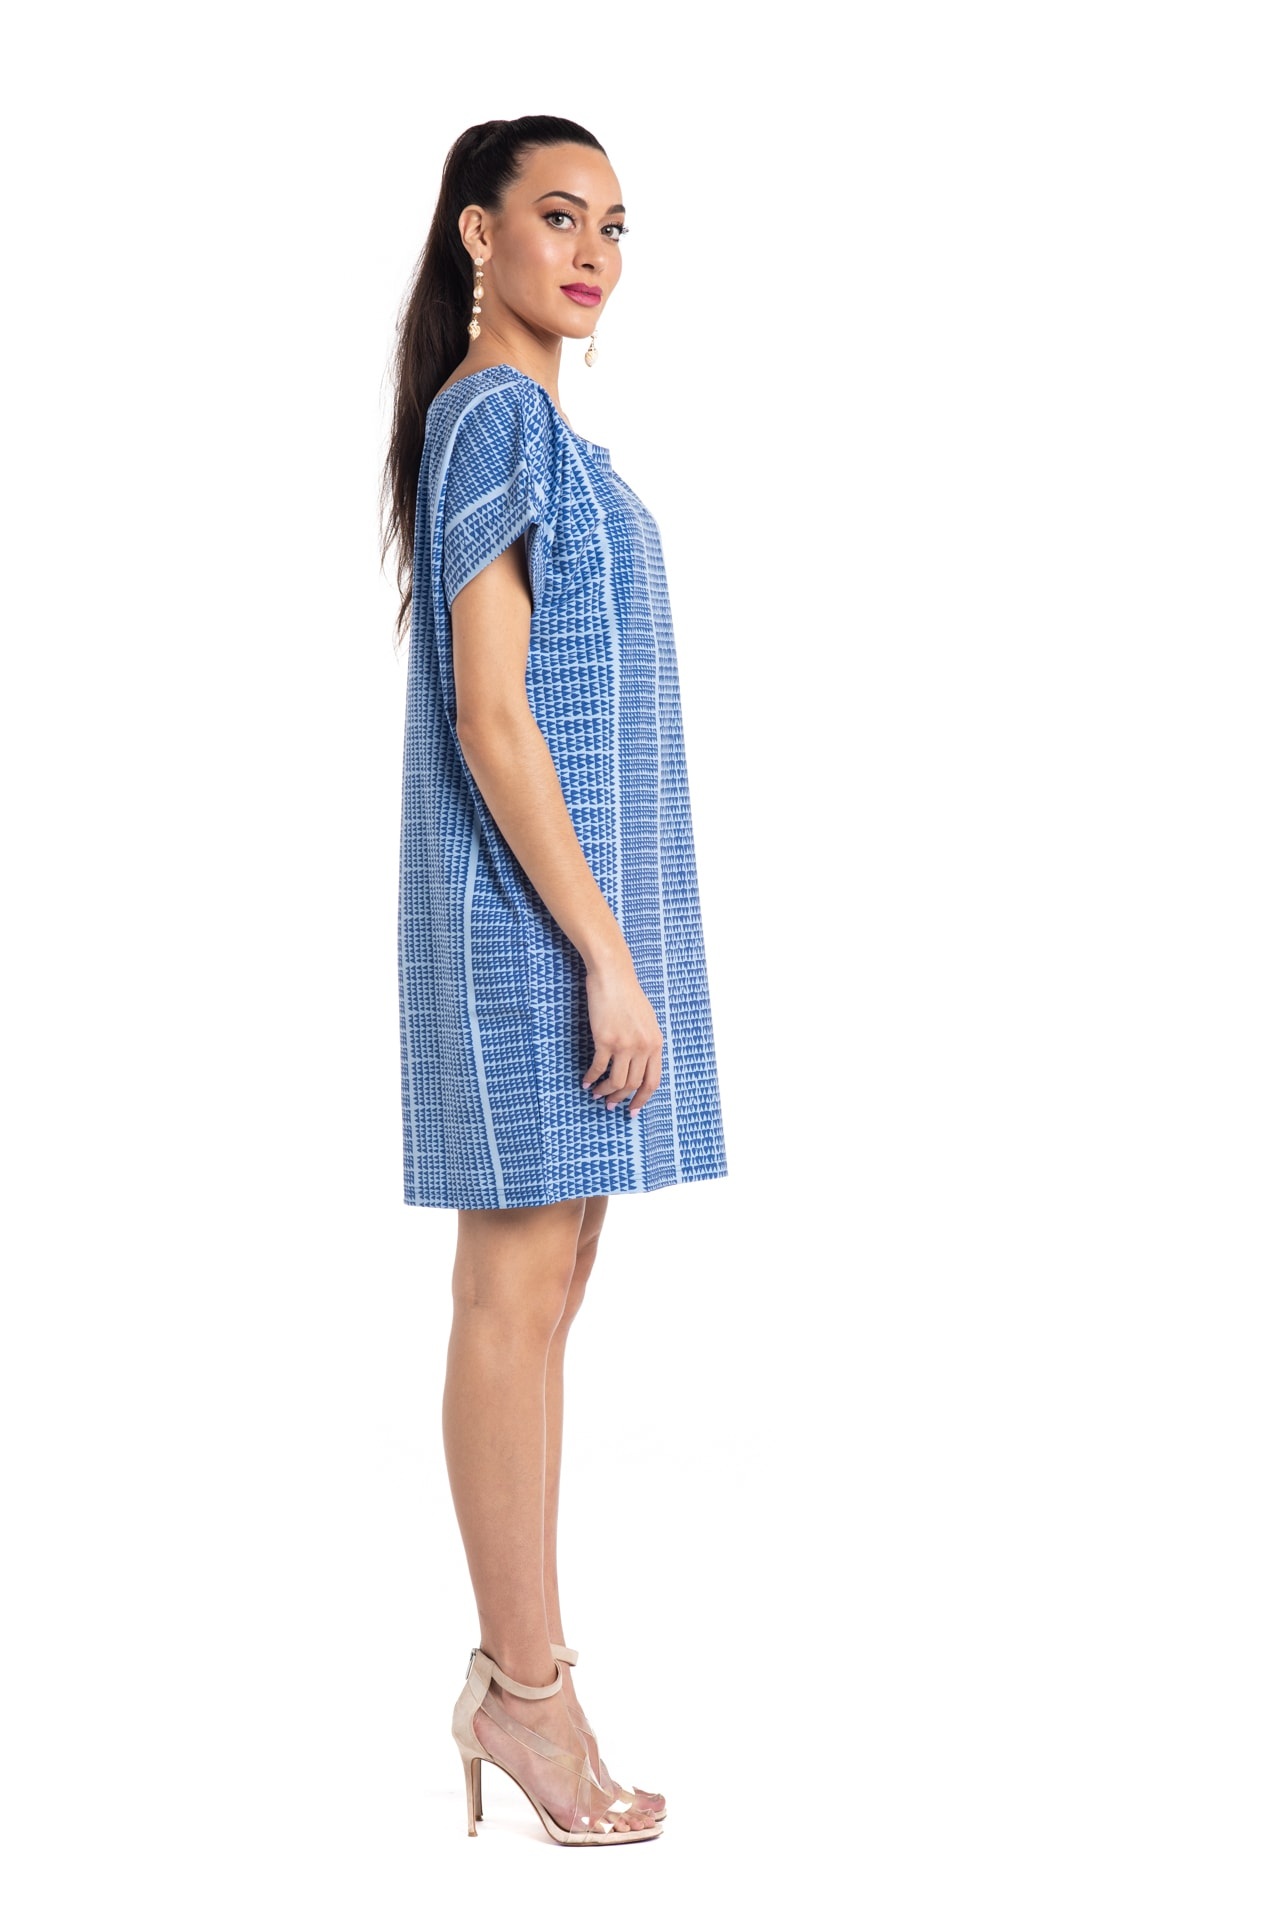 Model wearing Puaniu Shift Dress in Blue - Side View